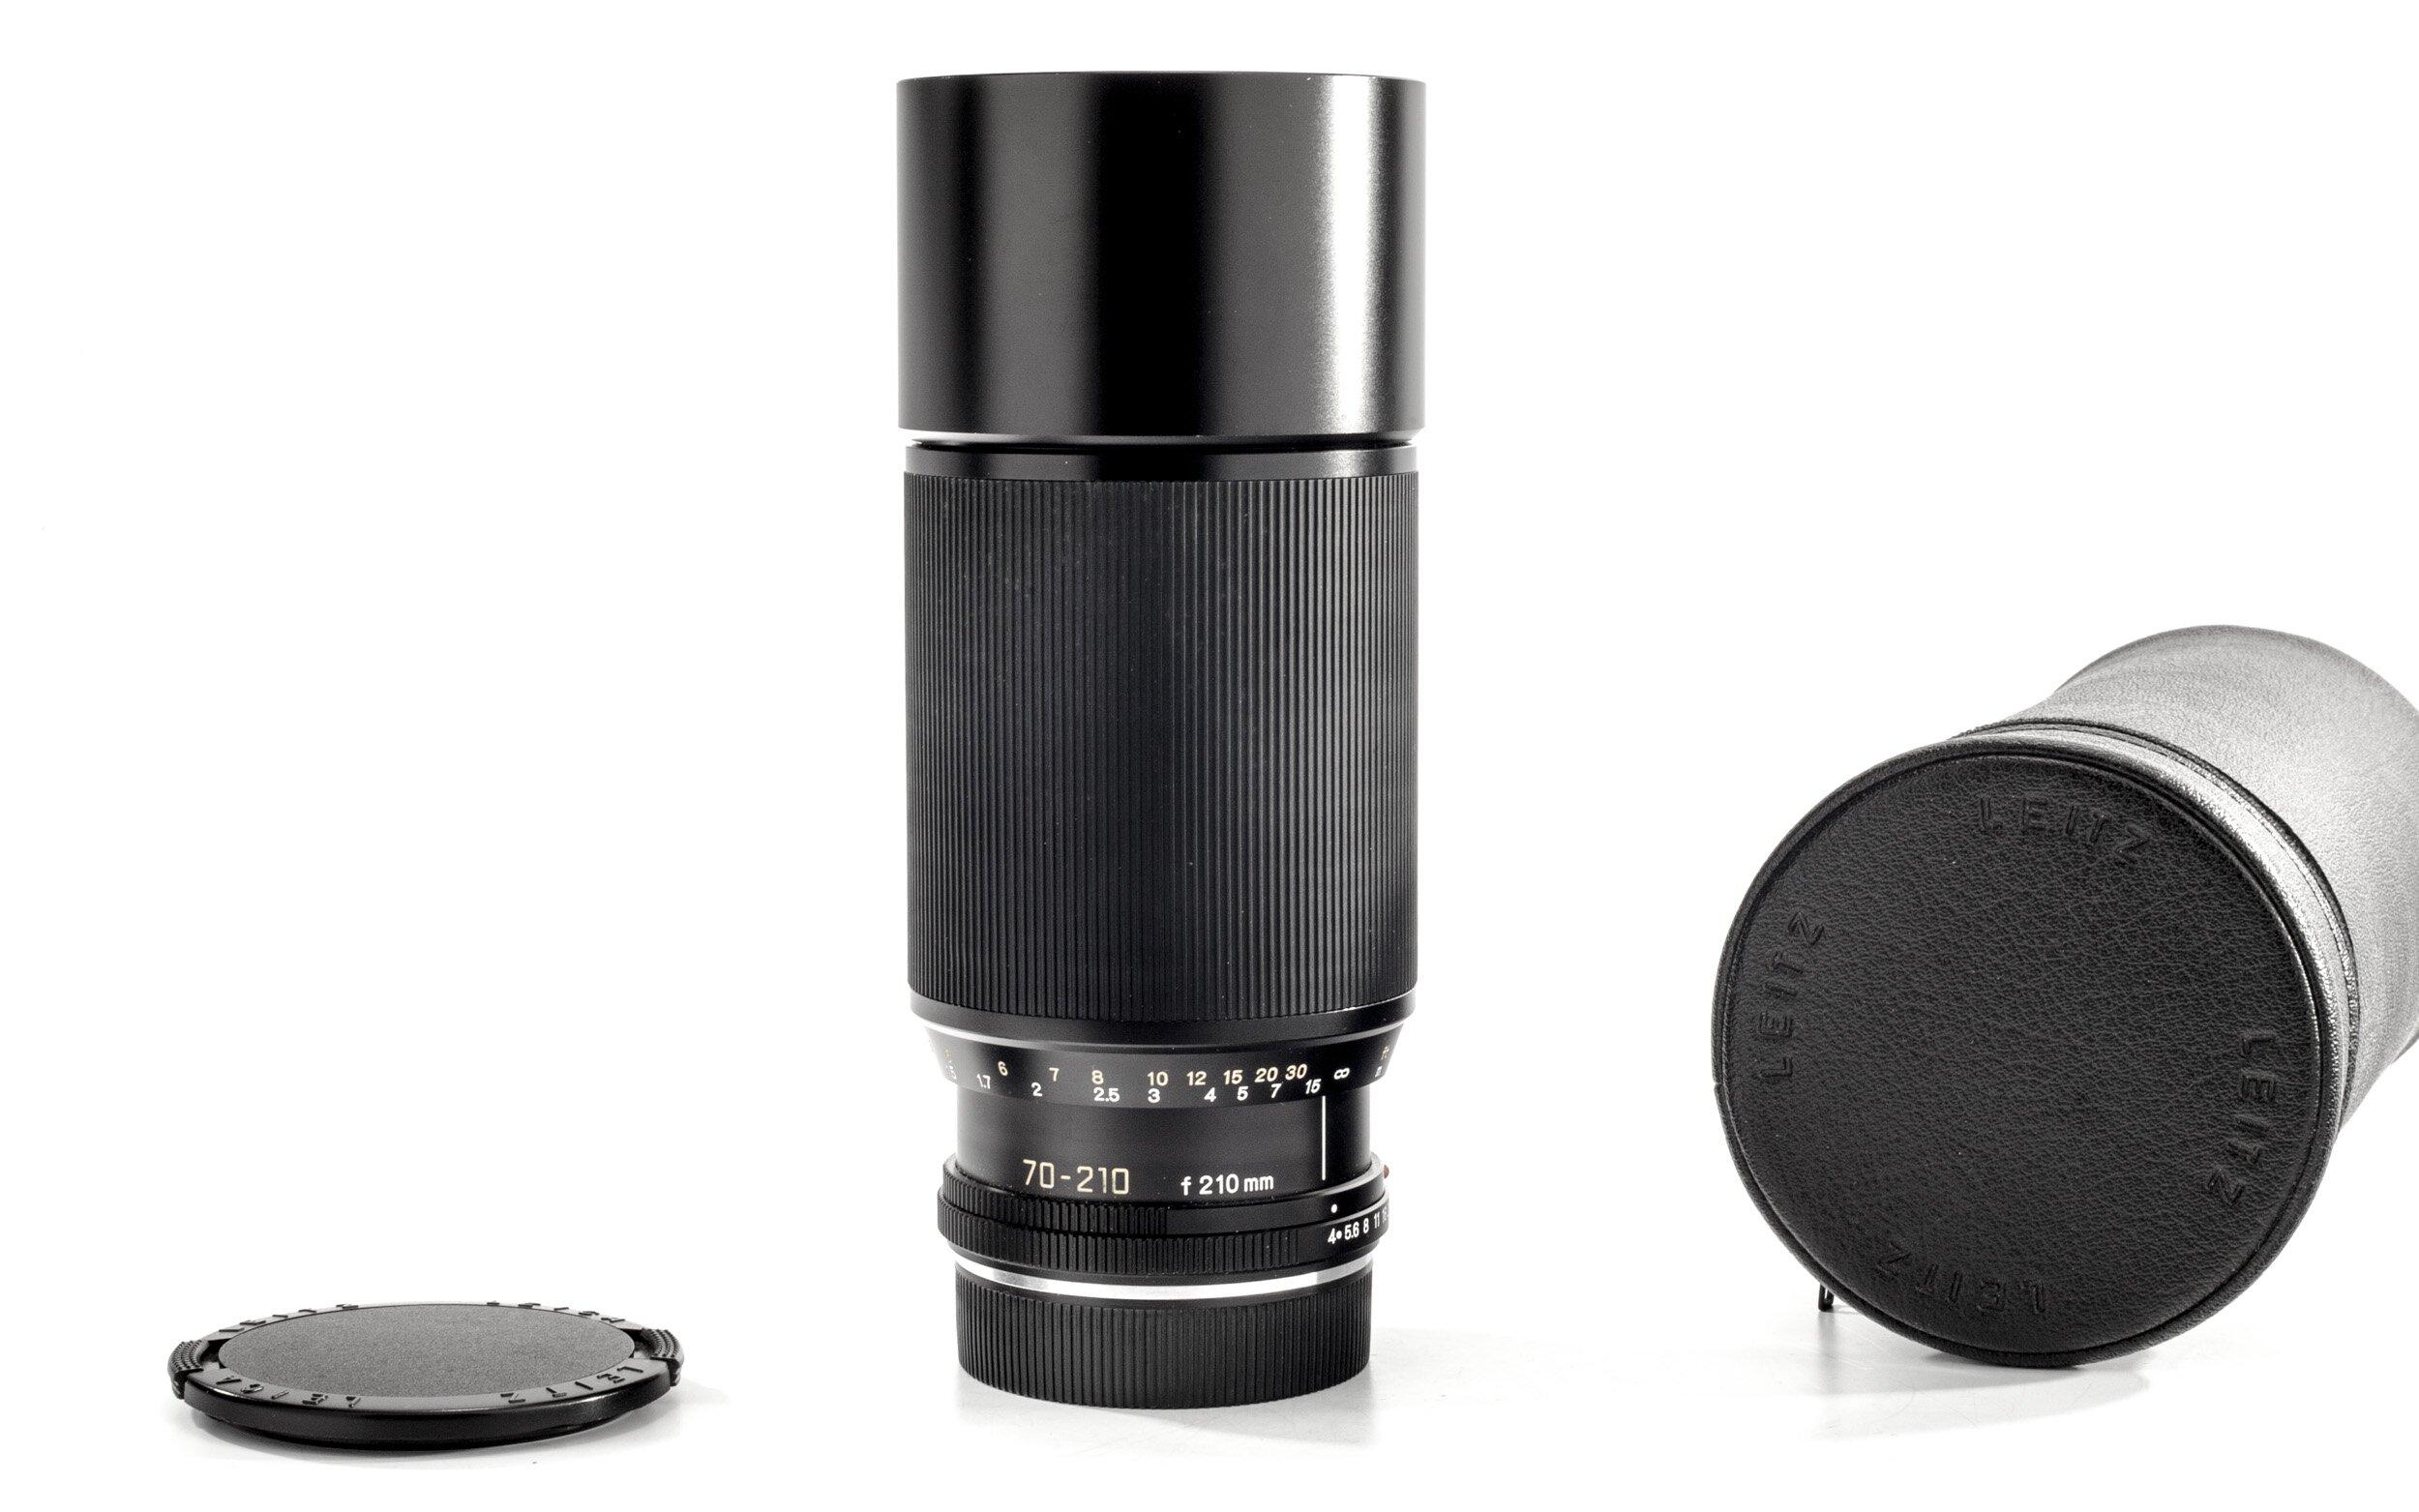 Leica R 4/70-210mm Vario-Elmar-R 3CAM 11246